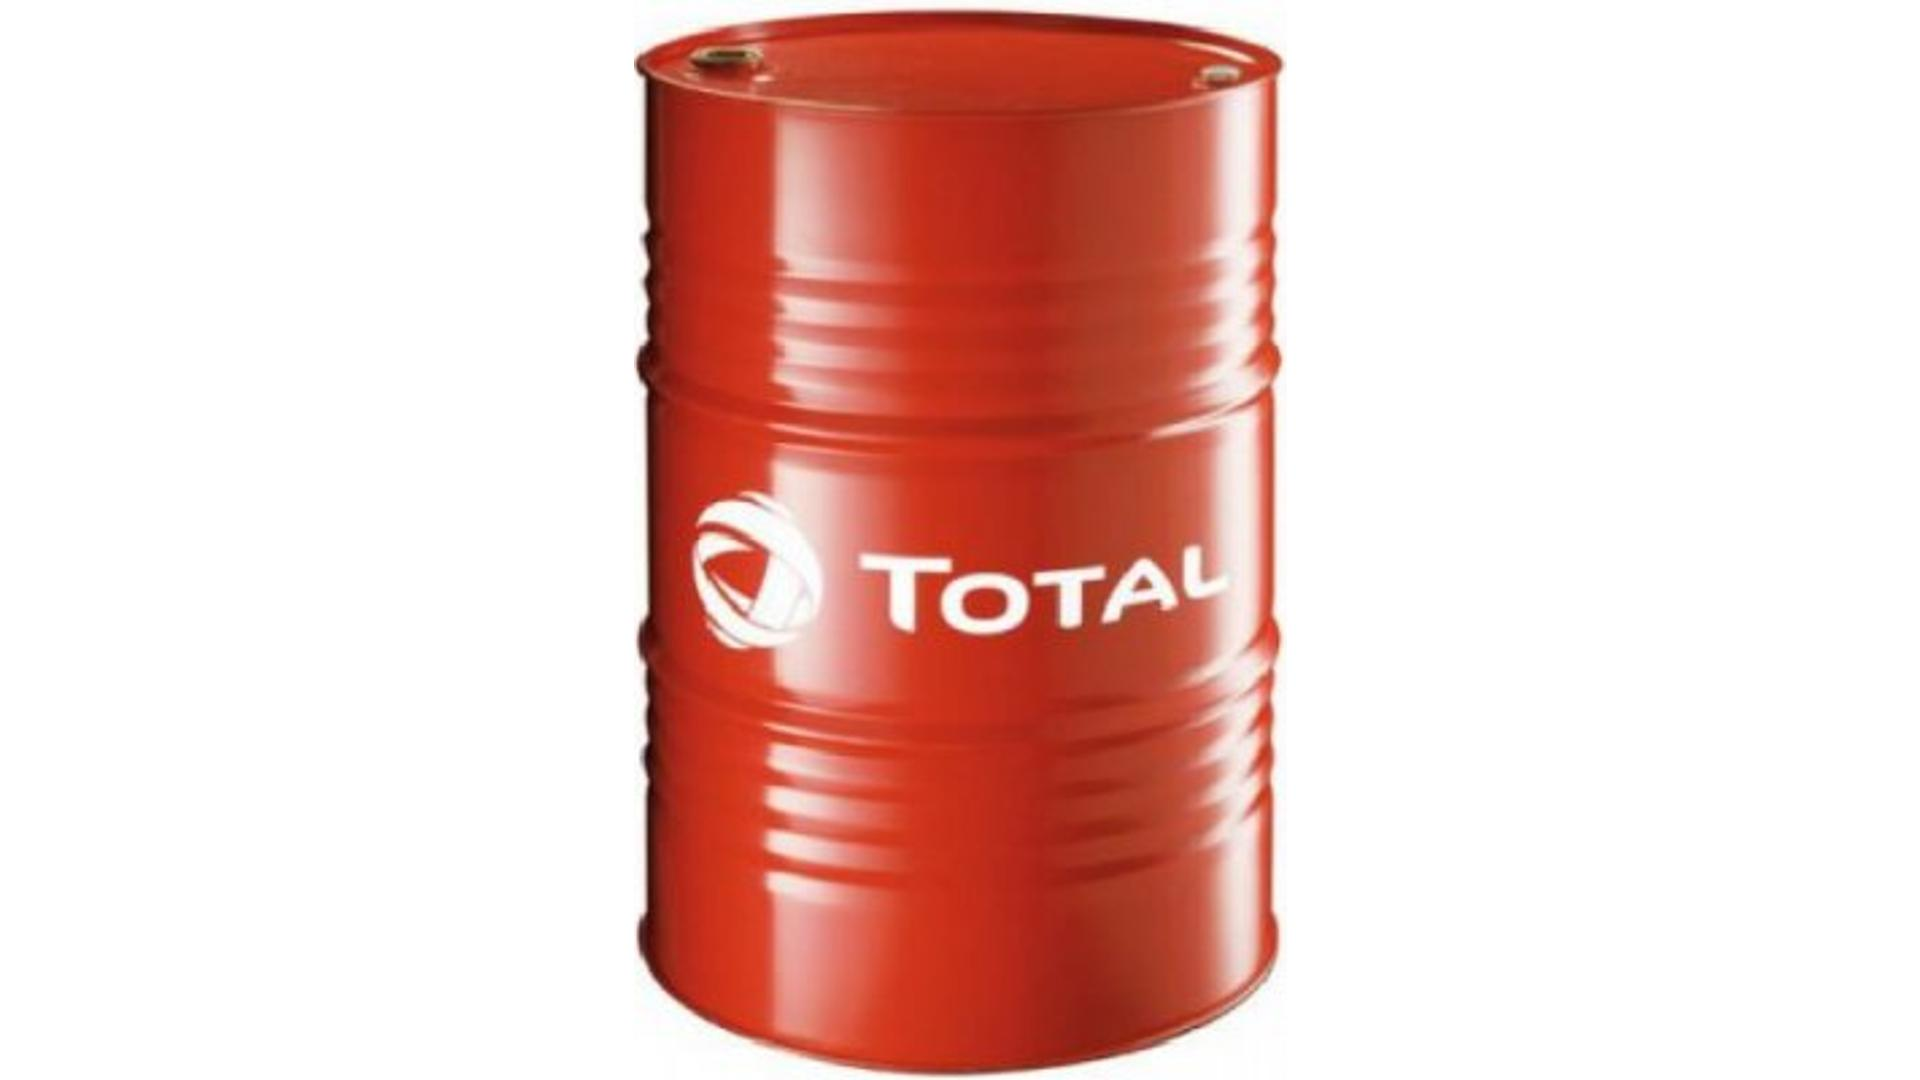 Total 5w-40 Quartz 9000 60L (132353)